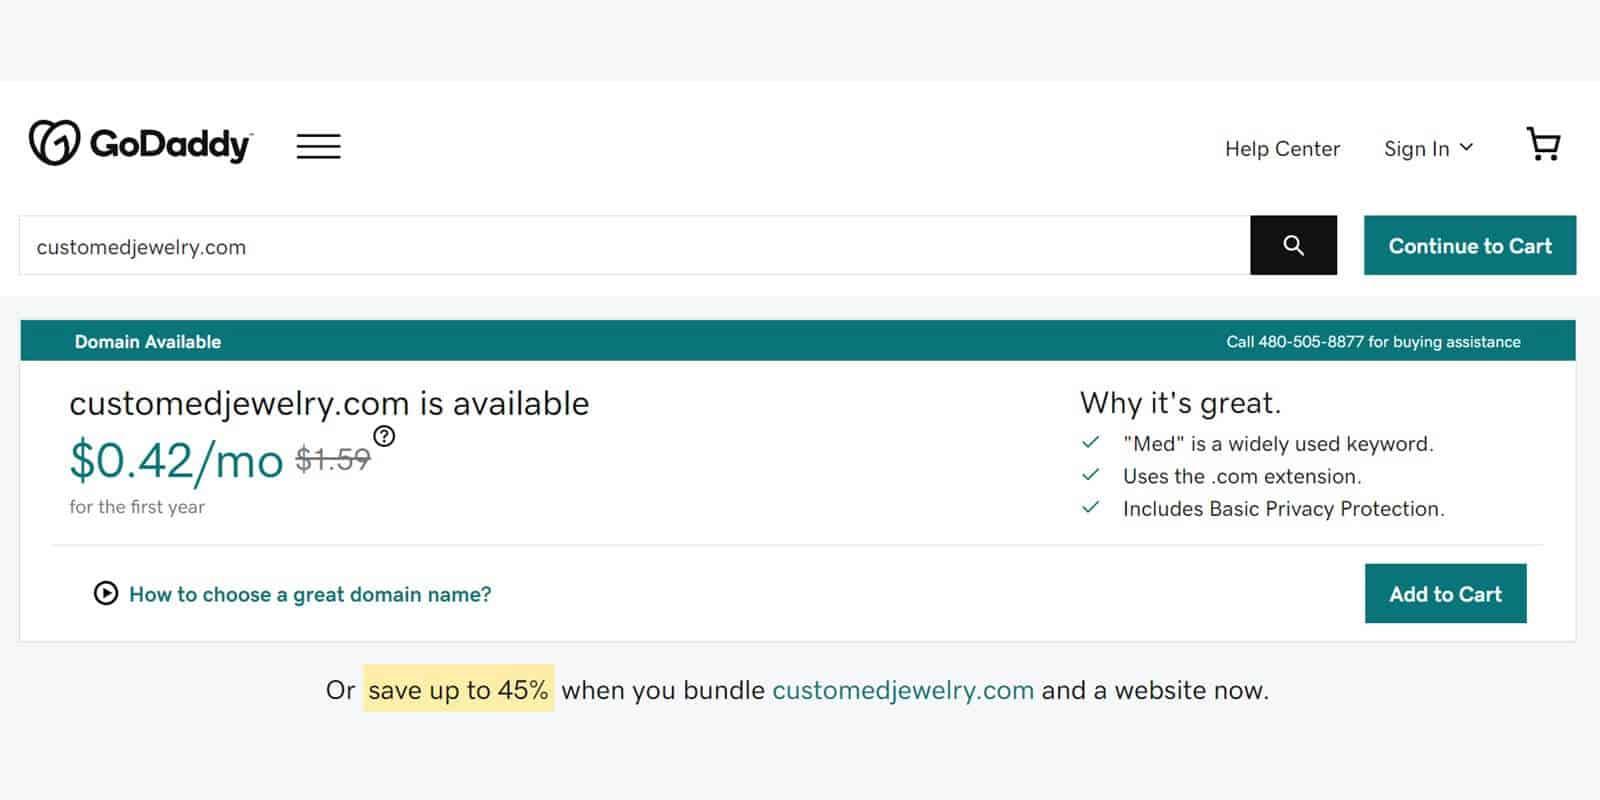 Verify domain name availability via a registrar